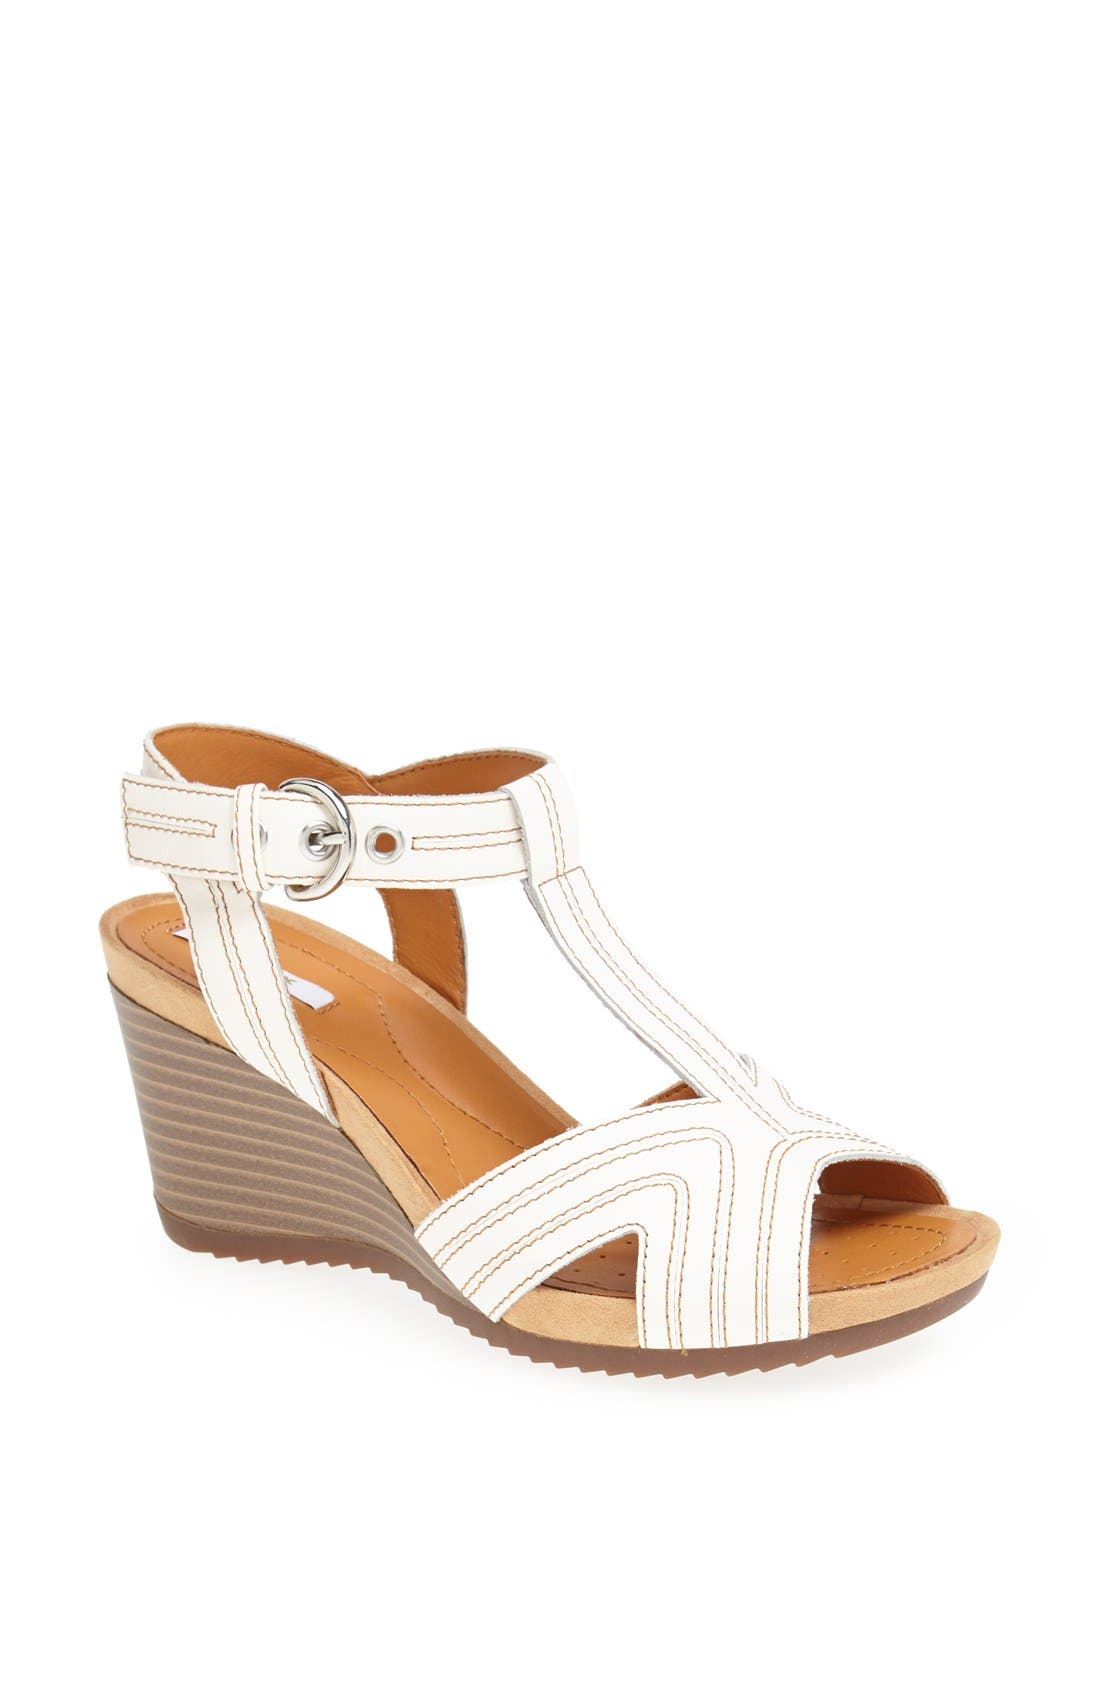 Alternate Image 1 Selected - Geox 'Roxy' Mid Wedge Sandal (Women)